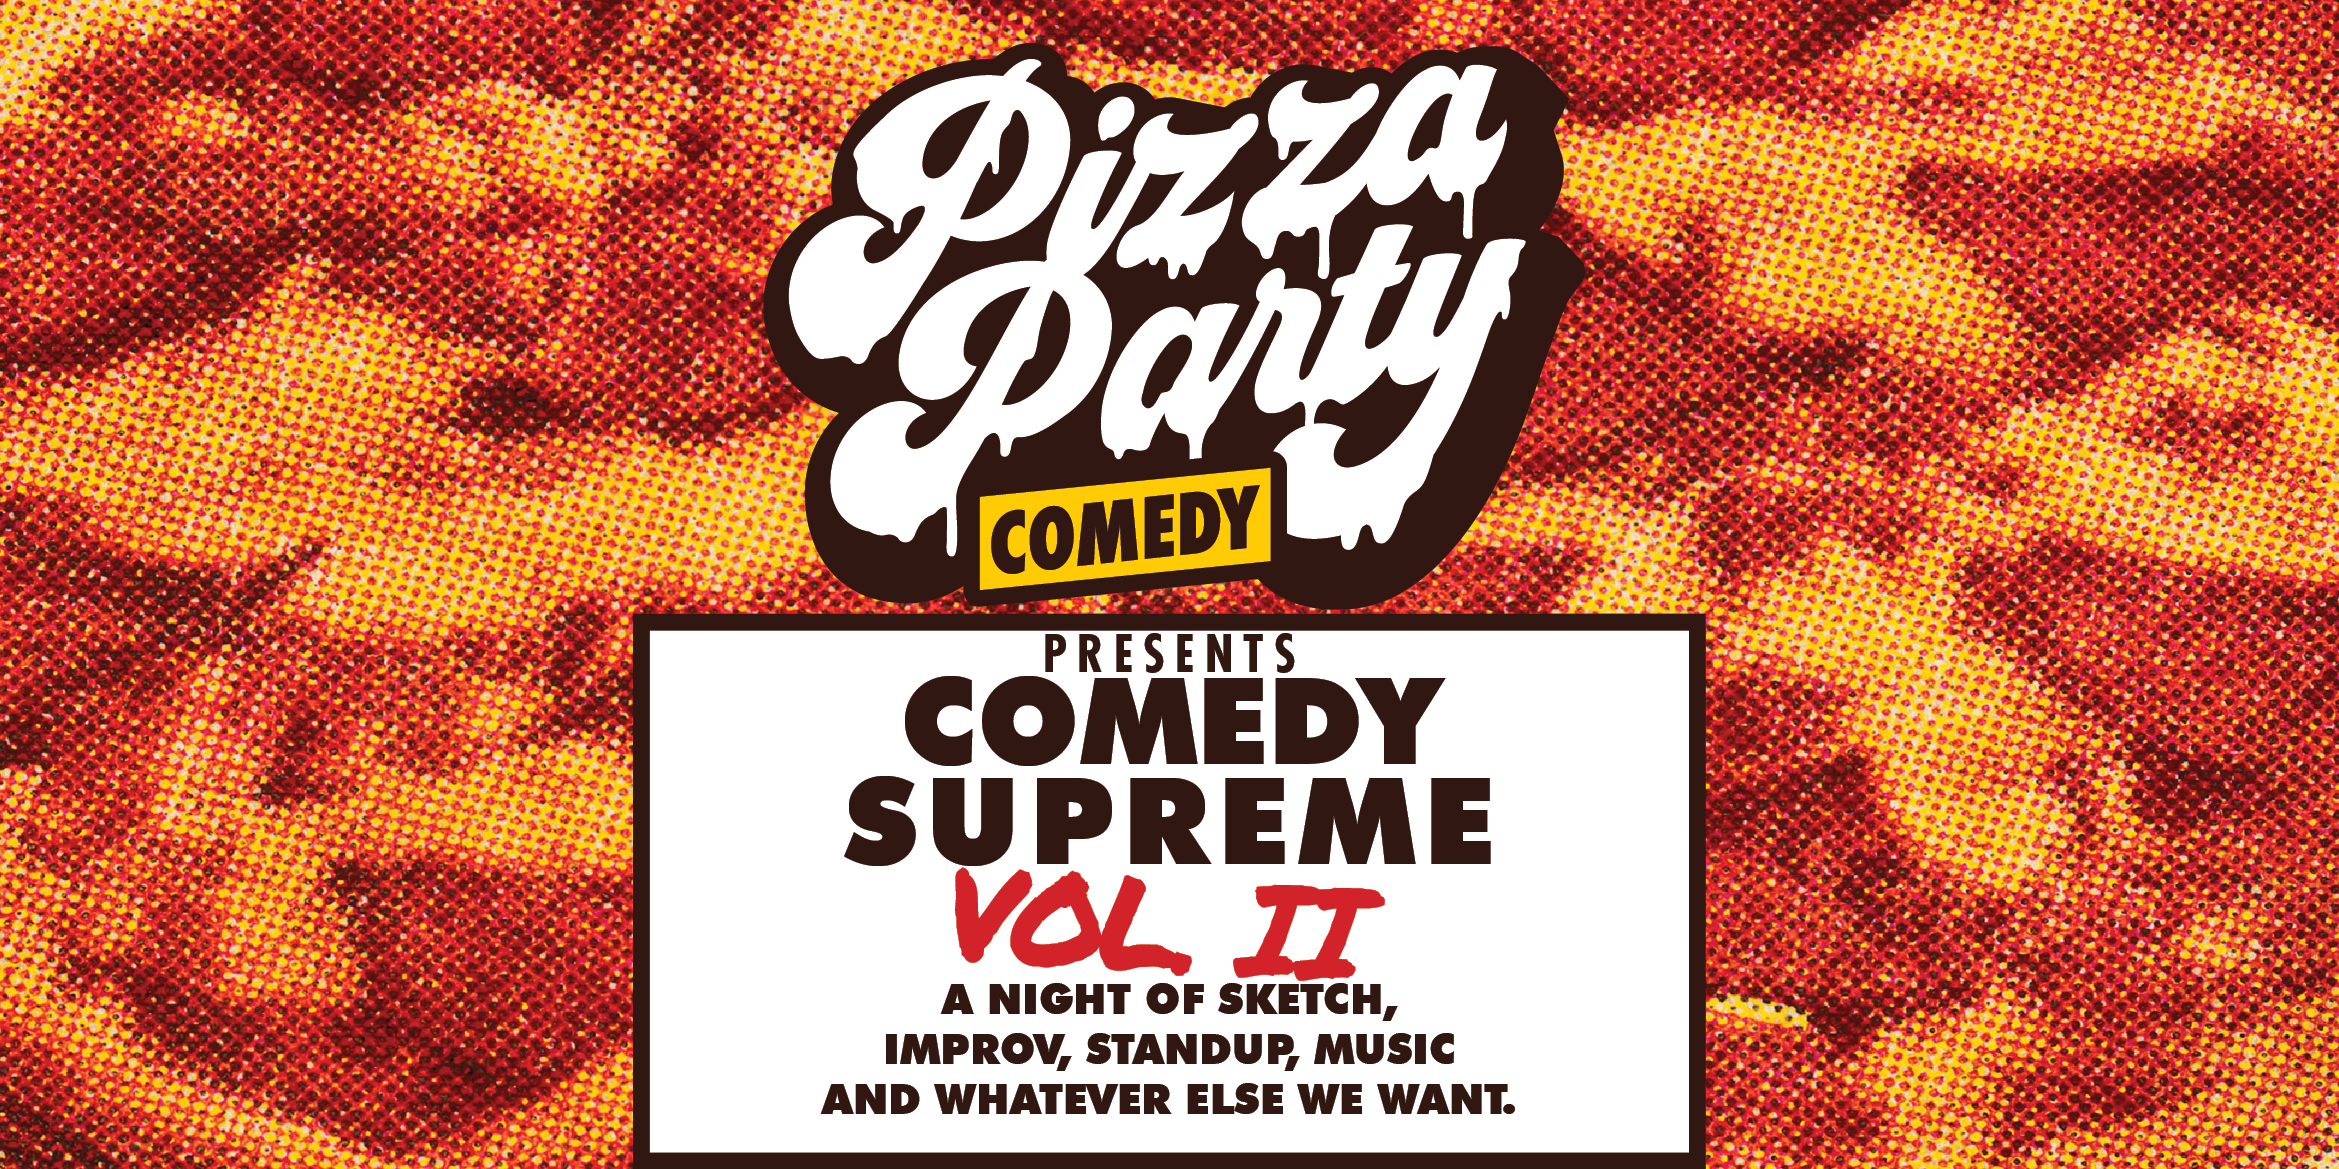 Comedy Supreme Vol II Horizontal_R1.jpg